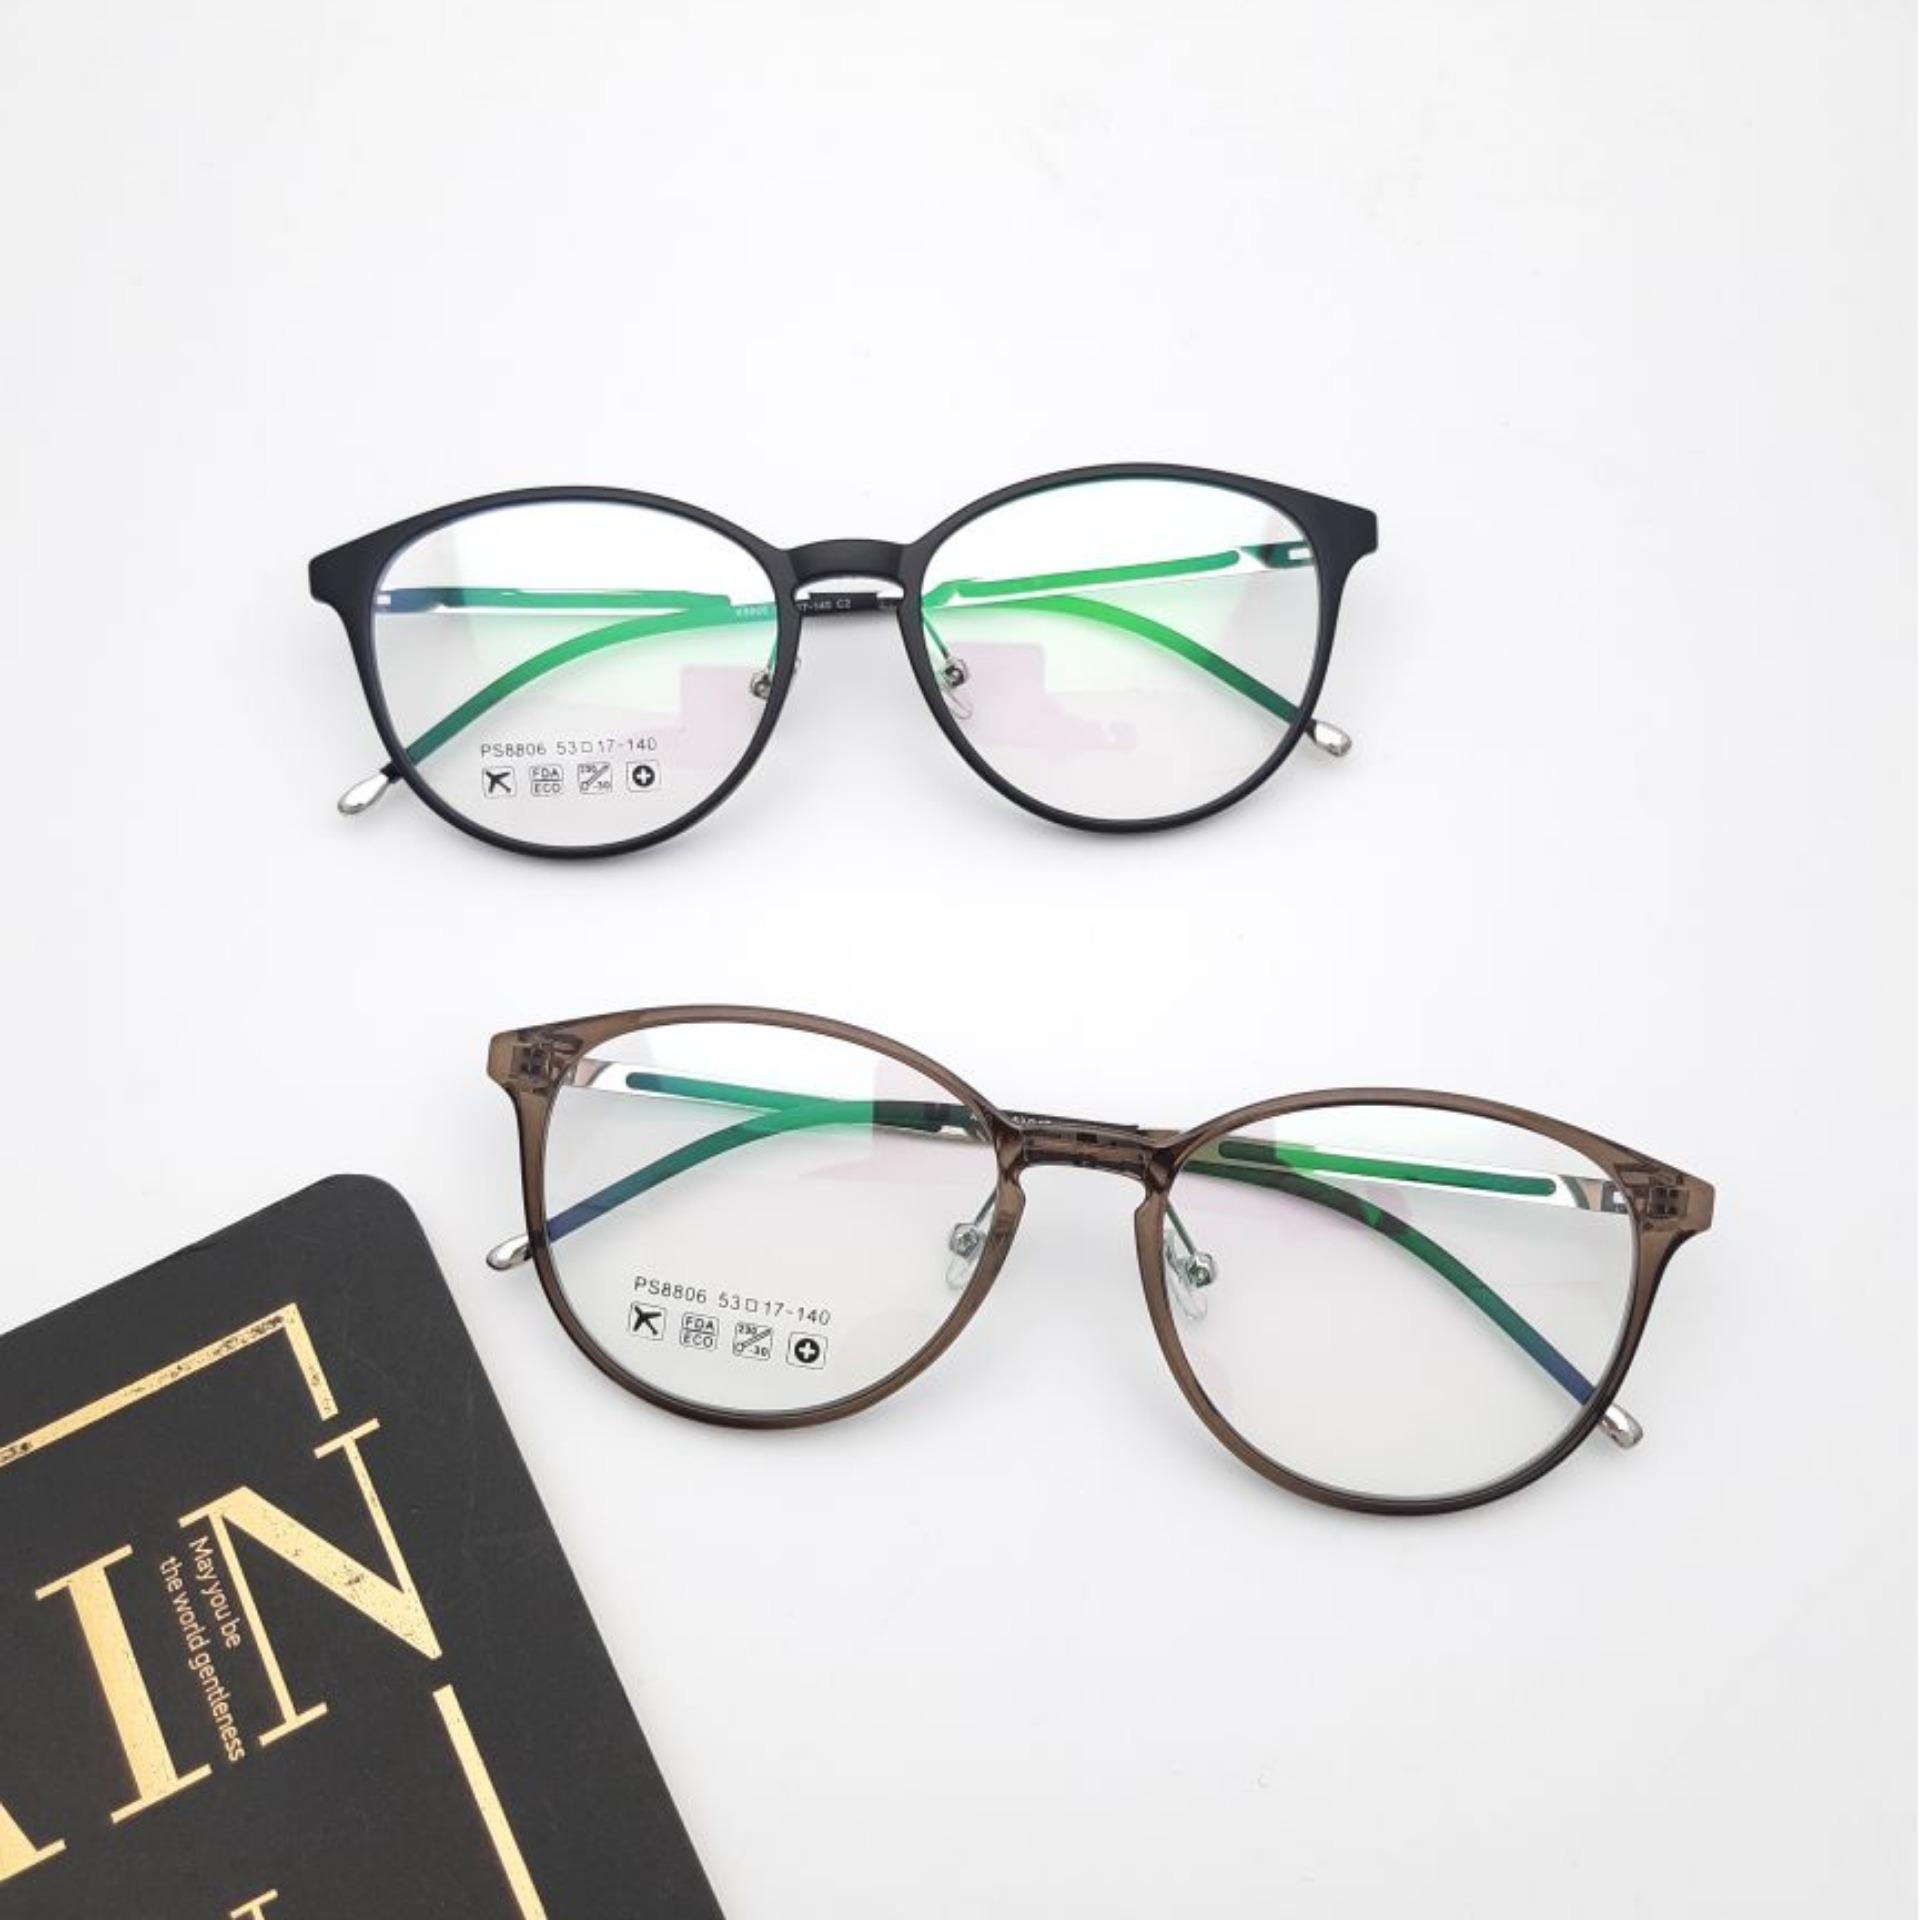 Baru Frame Kacamata Minus Vintage Kacamata Minus Frame Korea Vintage ... d0766fe72d